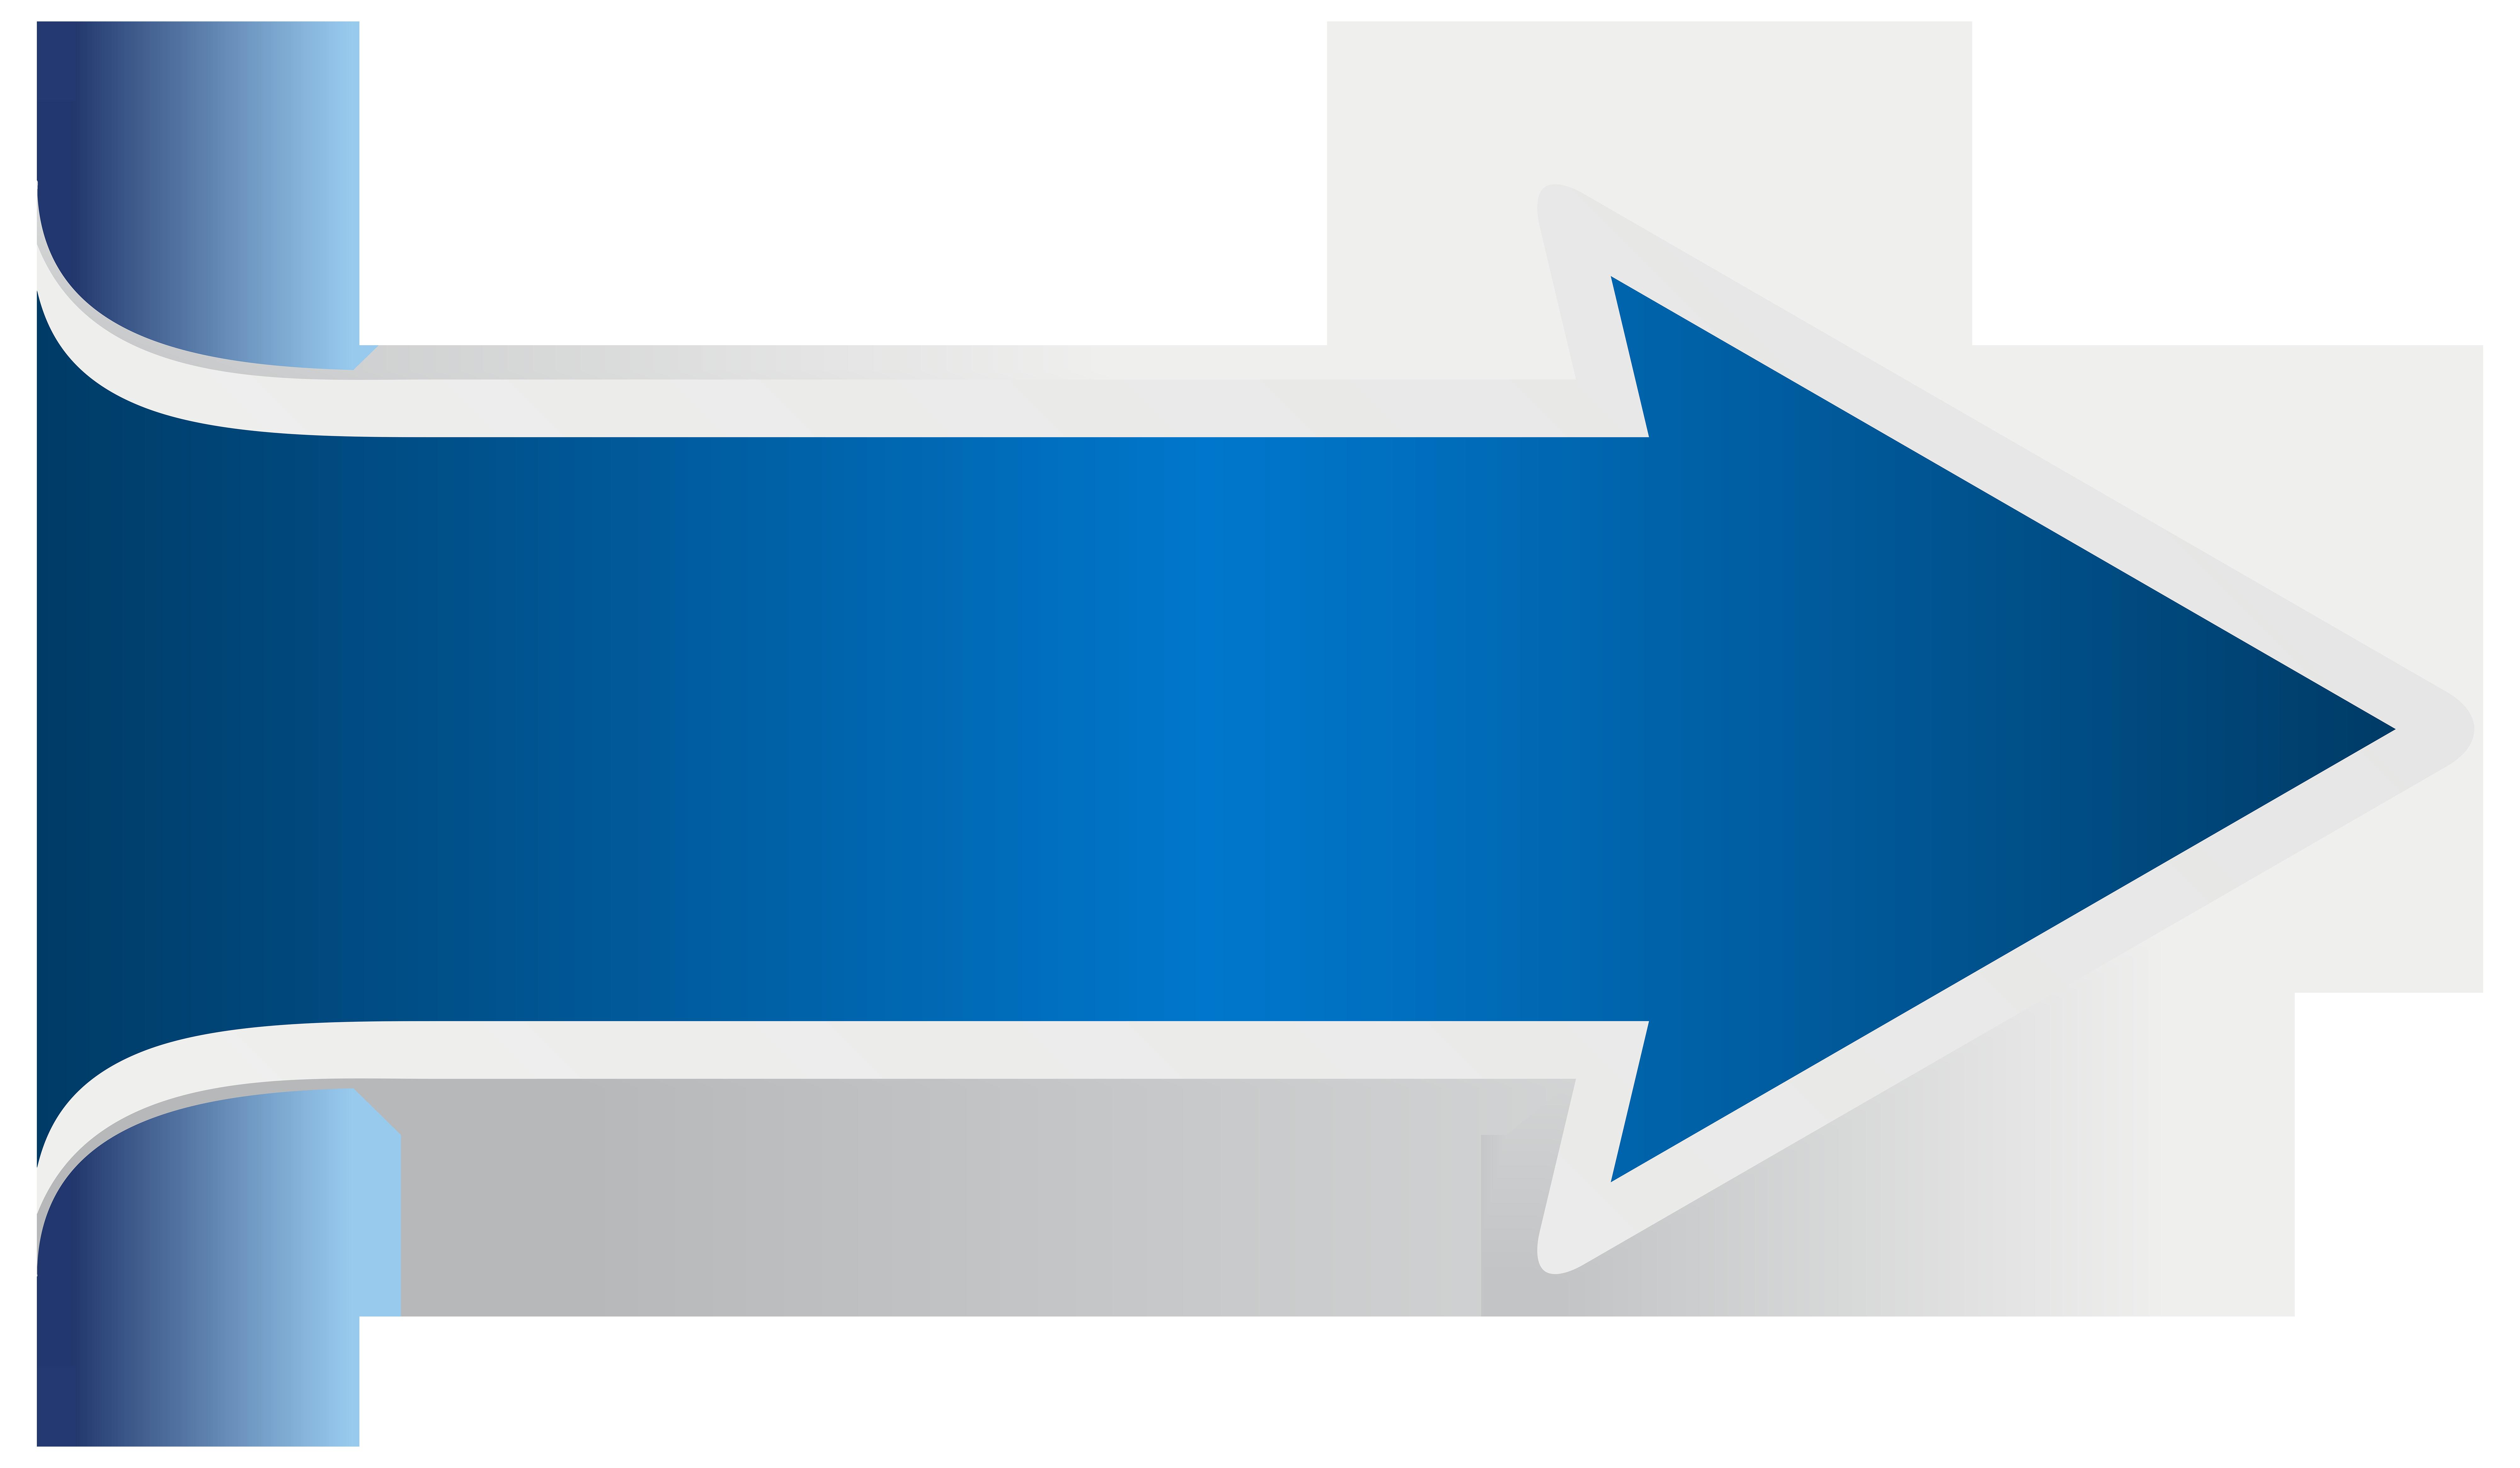 Clipart table blue table. Arrow png clip art